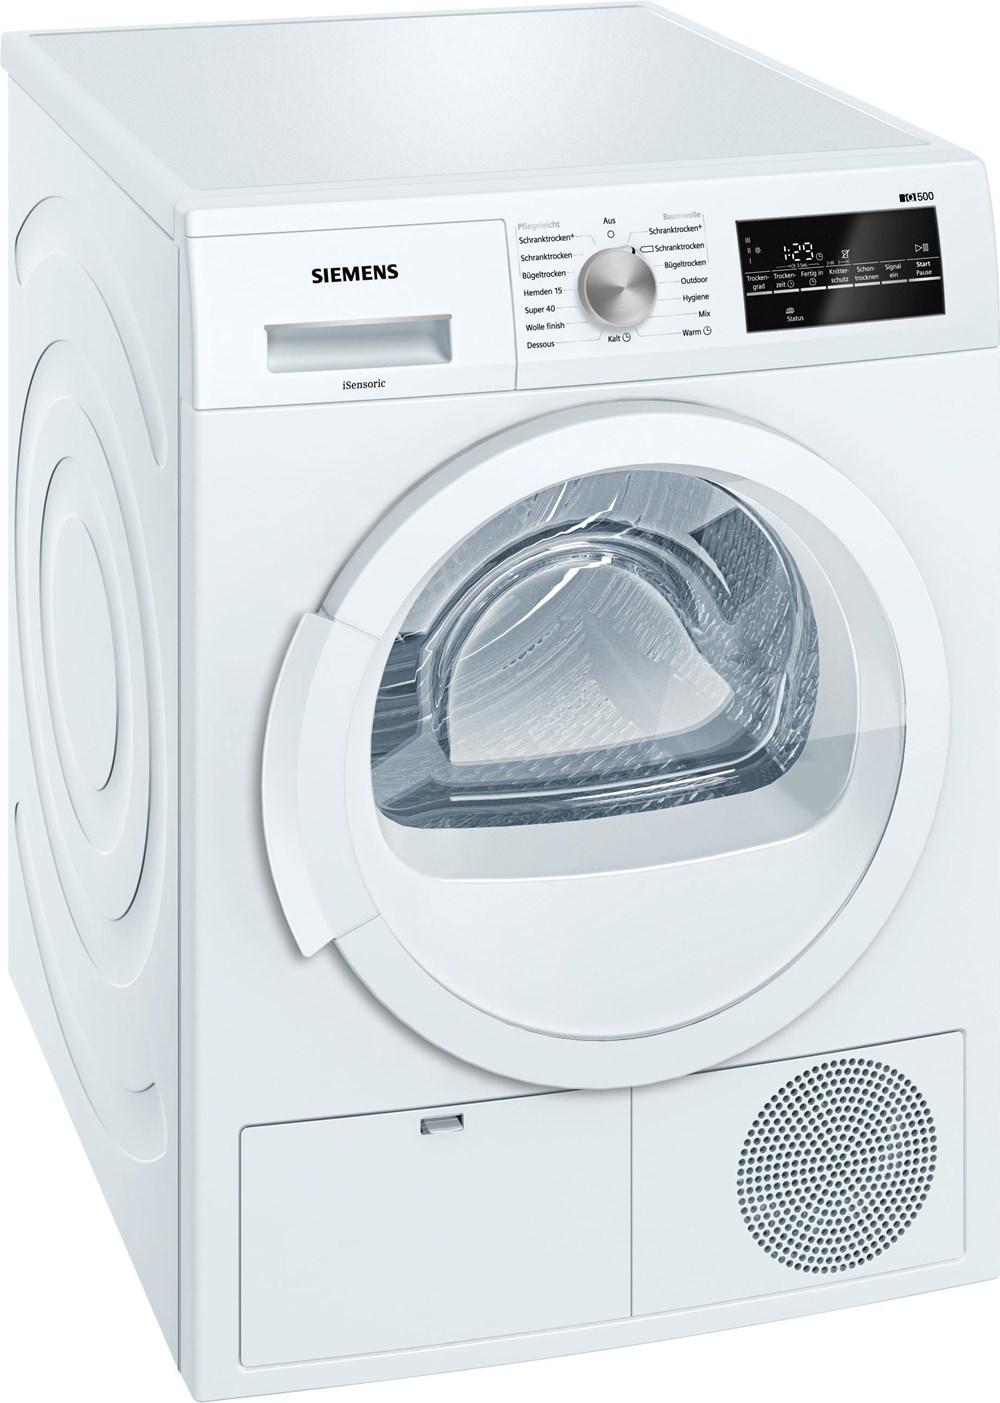 Siemens WT46G400 (EEK: B) - Preisvergleich